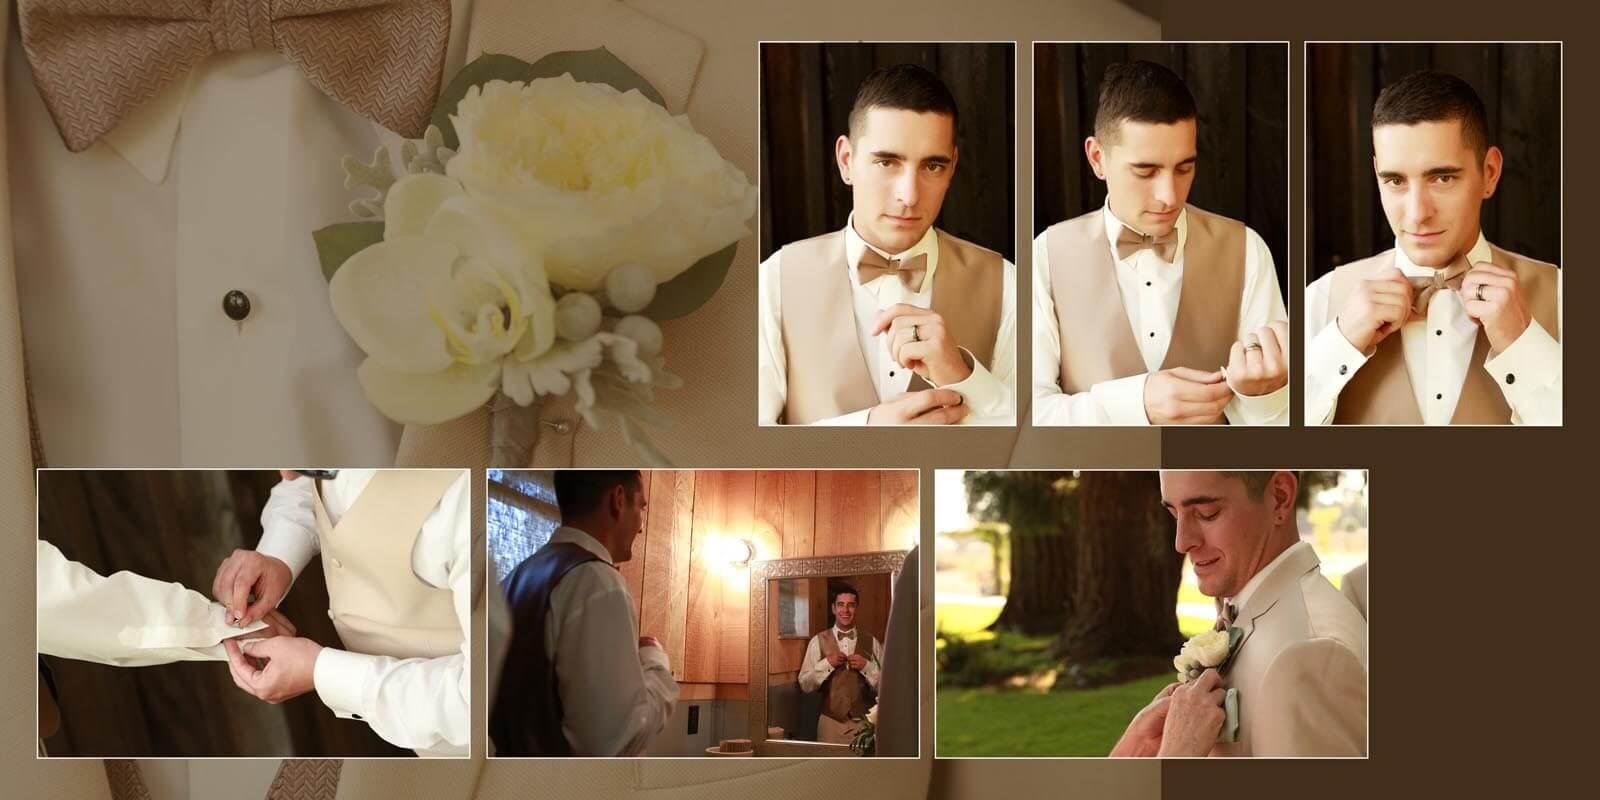 Jasper-House-Farm-Outdoor-Wedding-Lane-County-Oregon-photographers-004-005.jpg